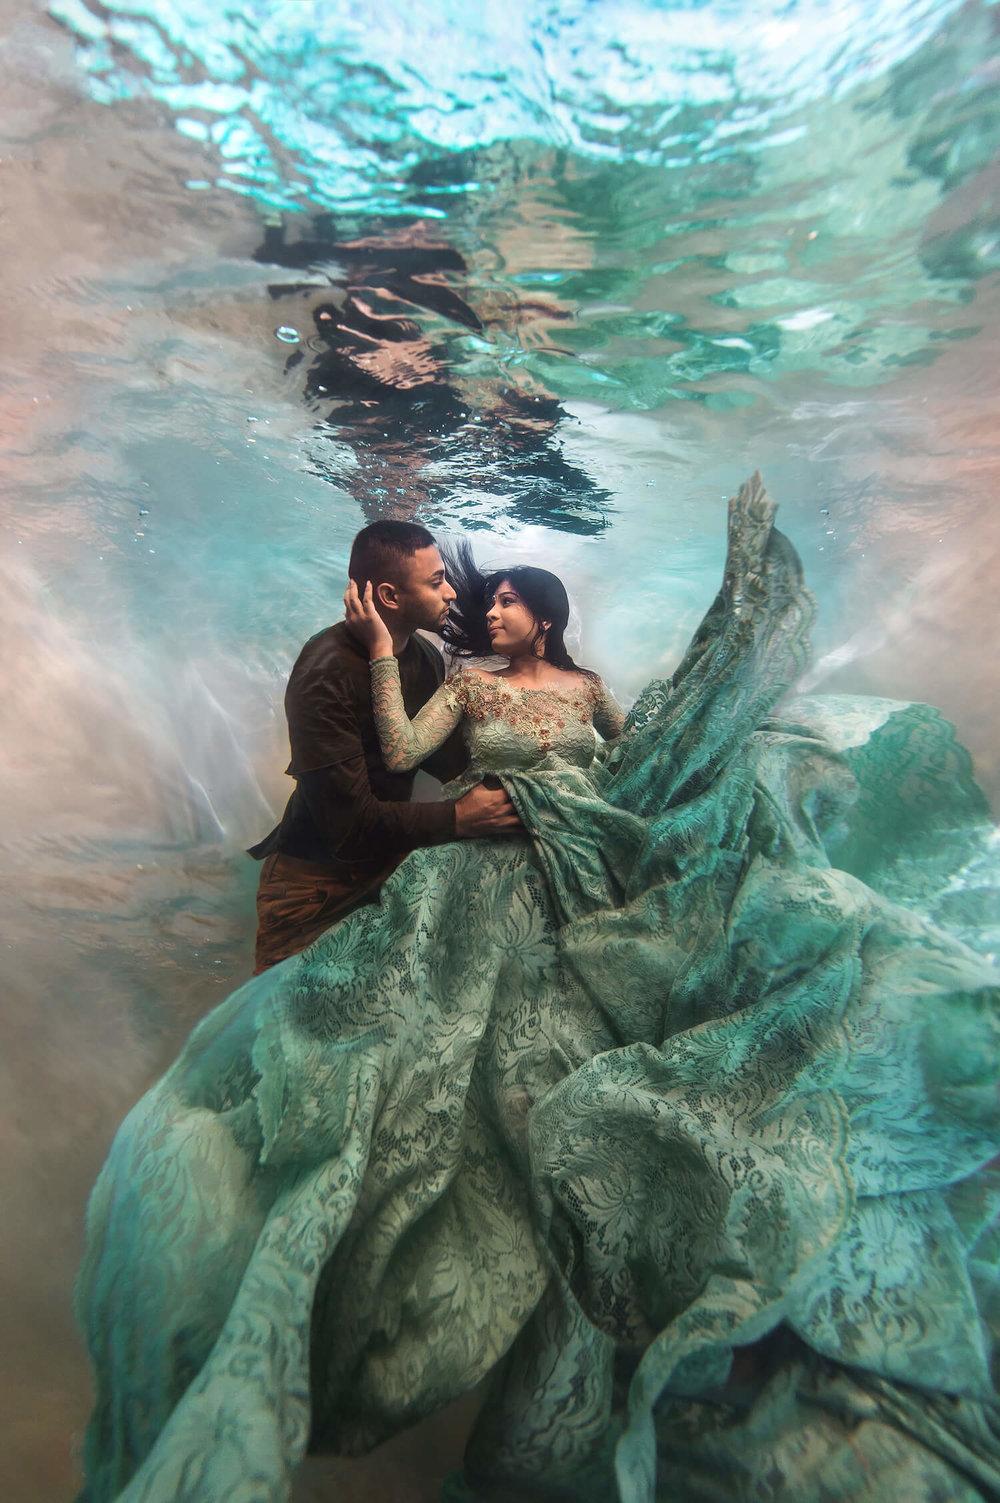 Ilse Moore underwater maternity match_007.jpg